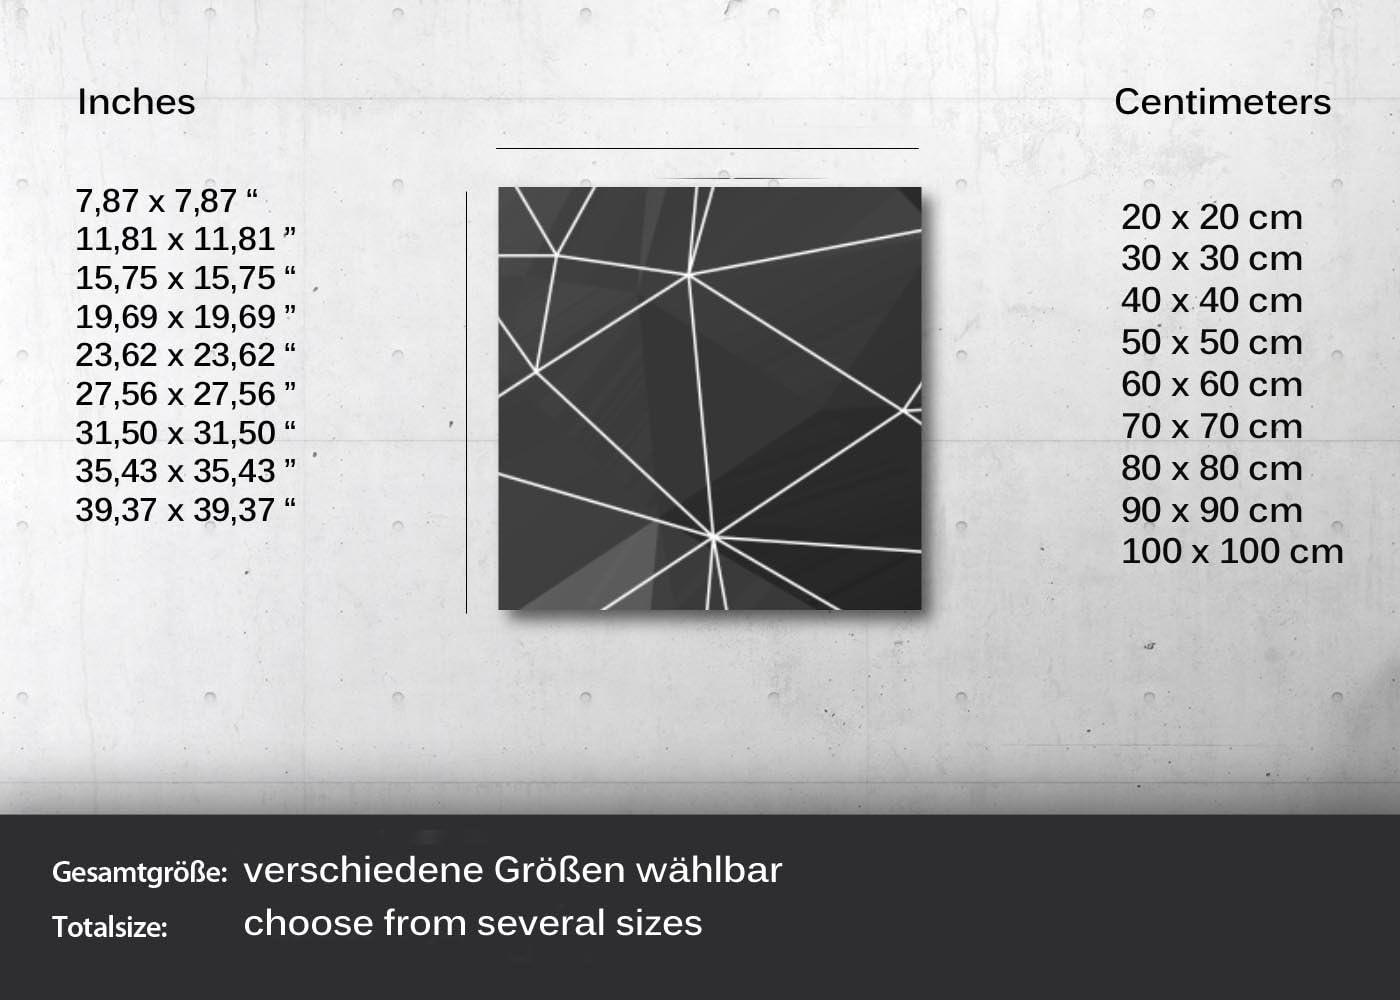 kunst-discounter Husky Welpen Wandbild A06212 Canvas Leinwandbild quadratisch auf Keilrahmen Gr/ö/ße 20 x 20 cm